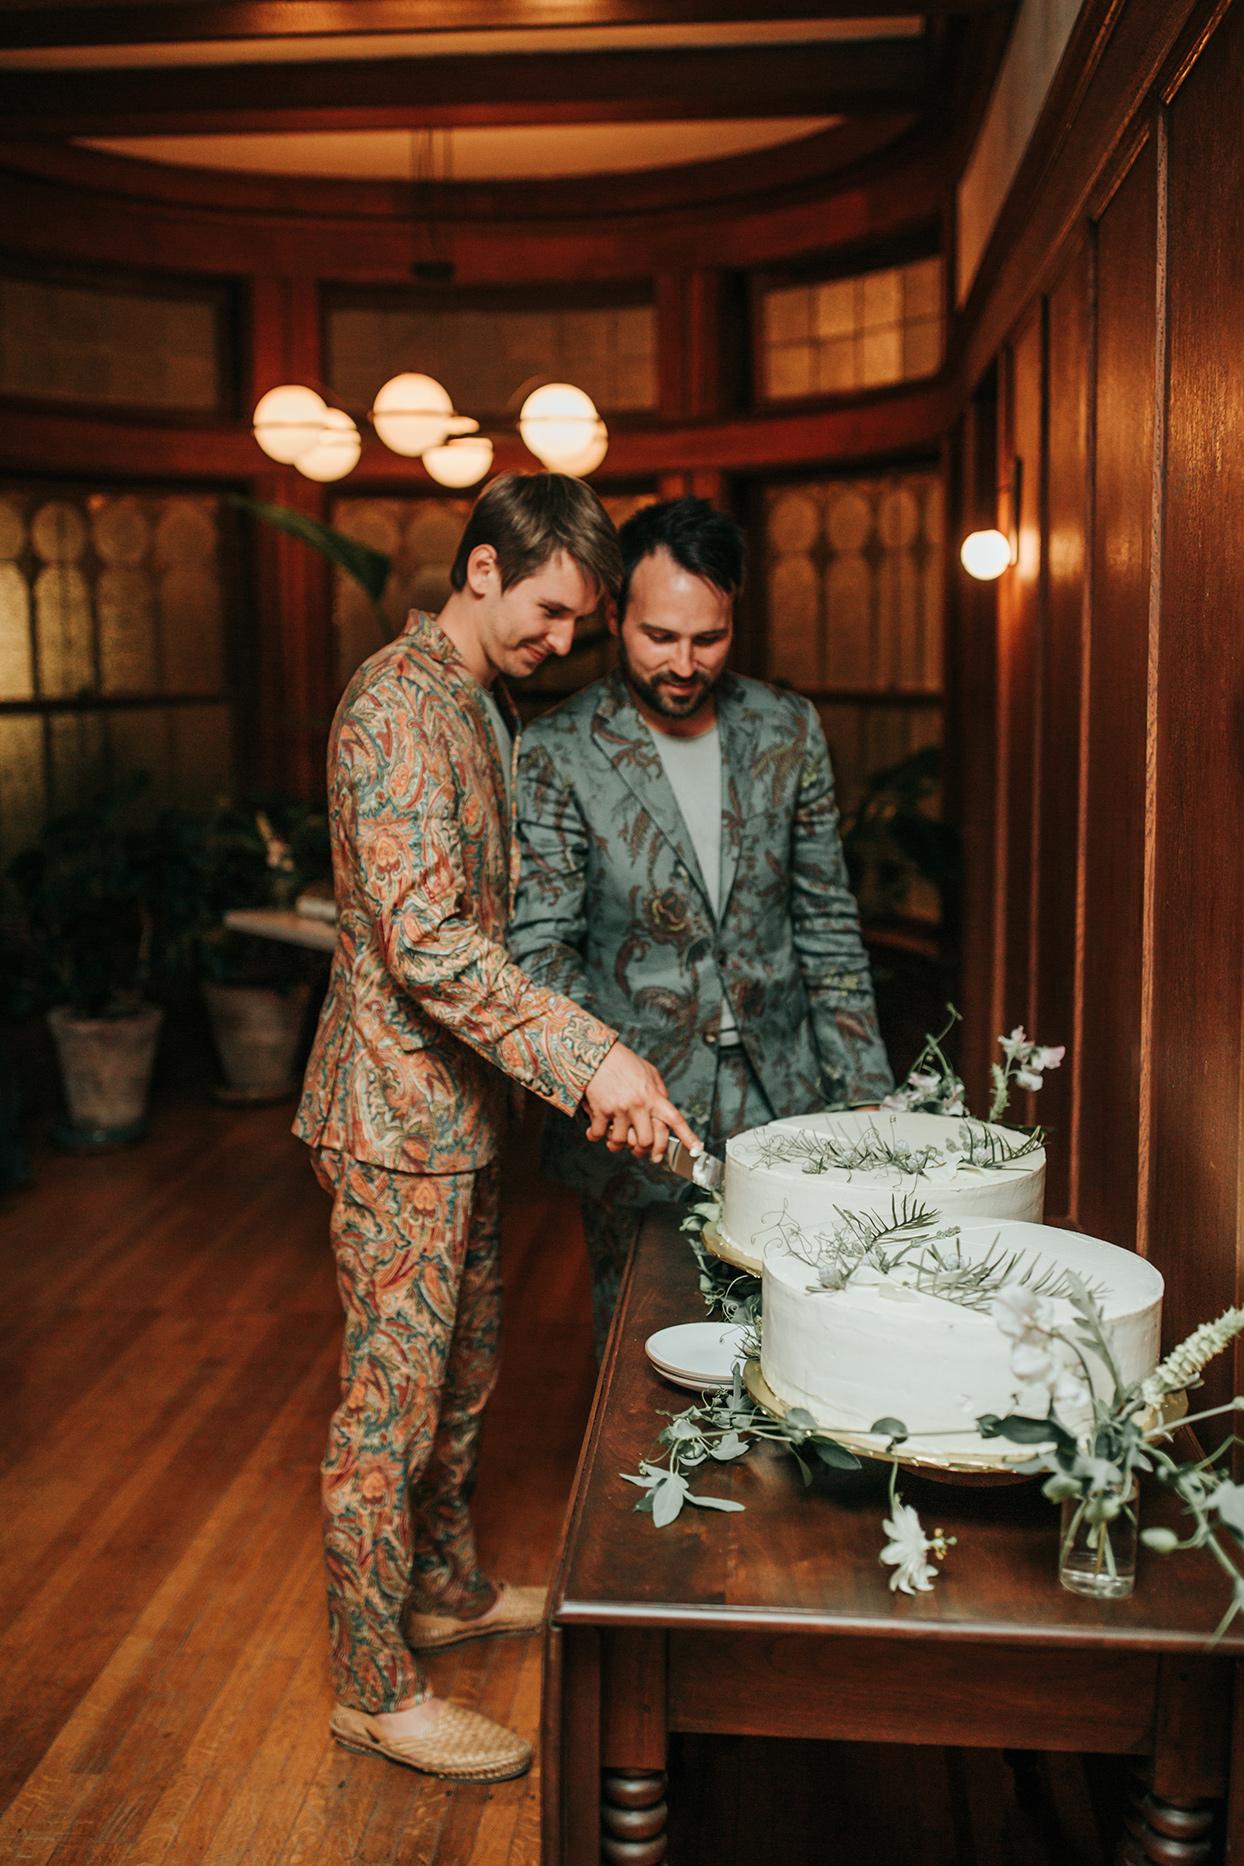 austin alex grooms cutting cake